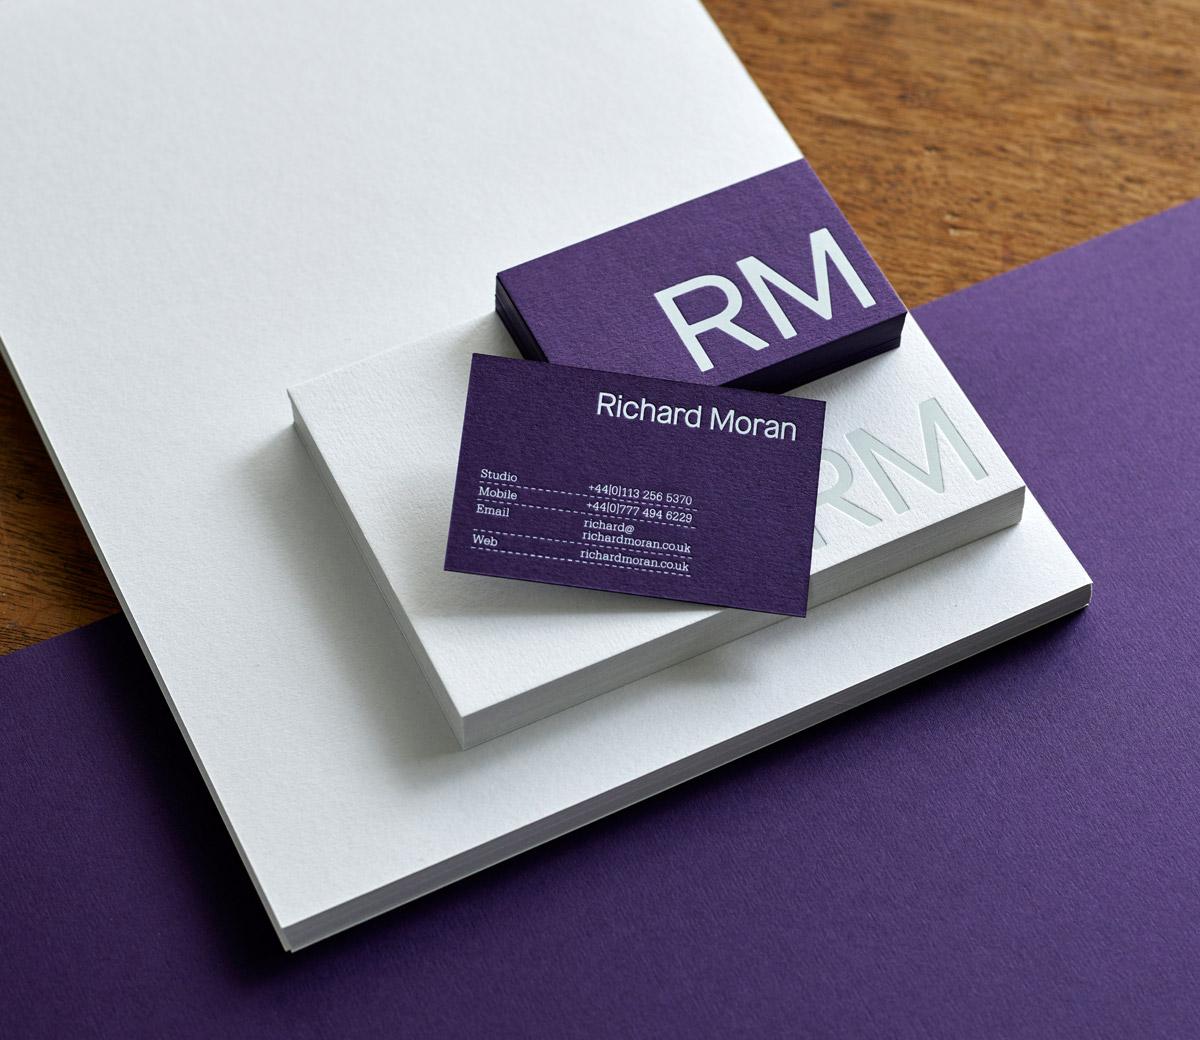 Brand identity and stationery set for UK photographer Richard Moran by Leeds based graphic design studio Journal